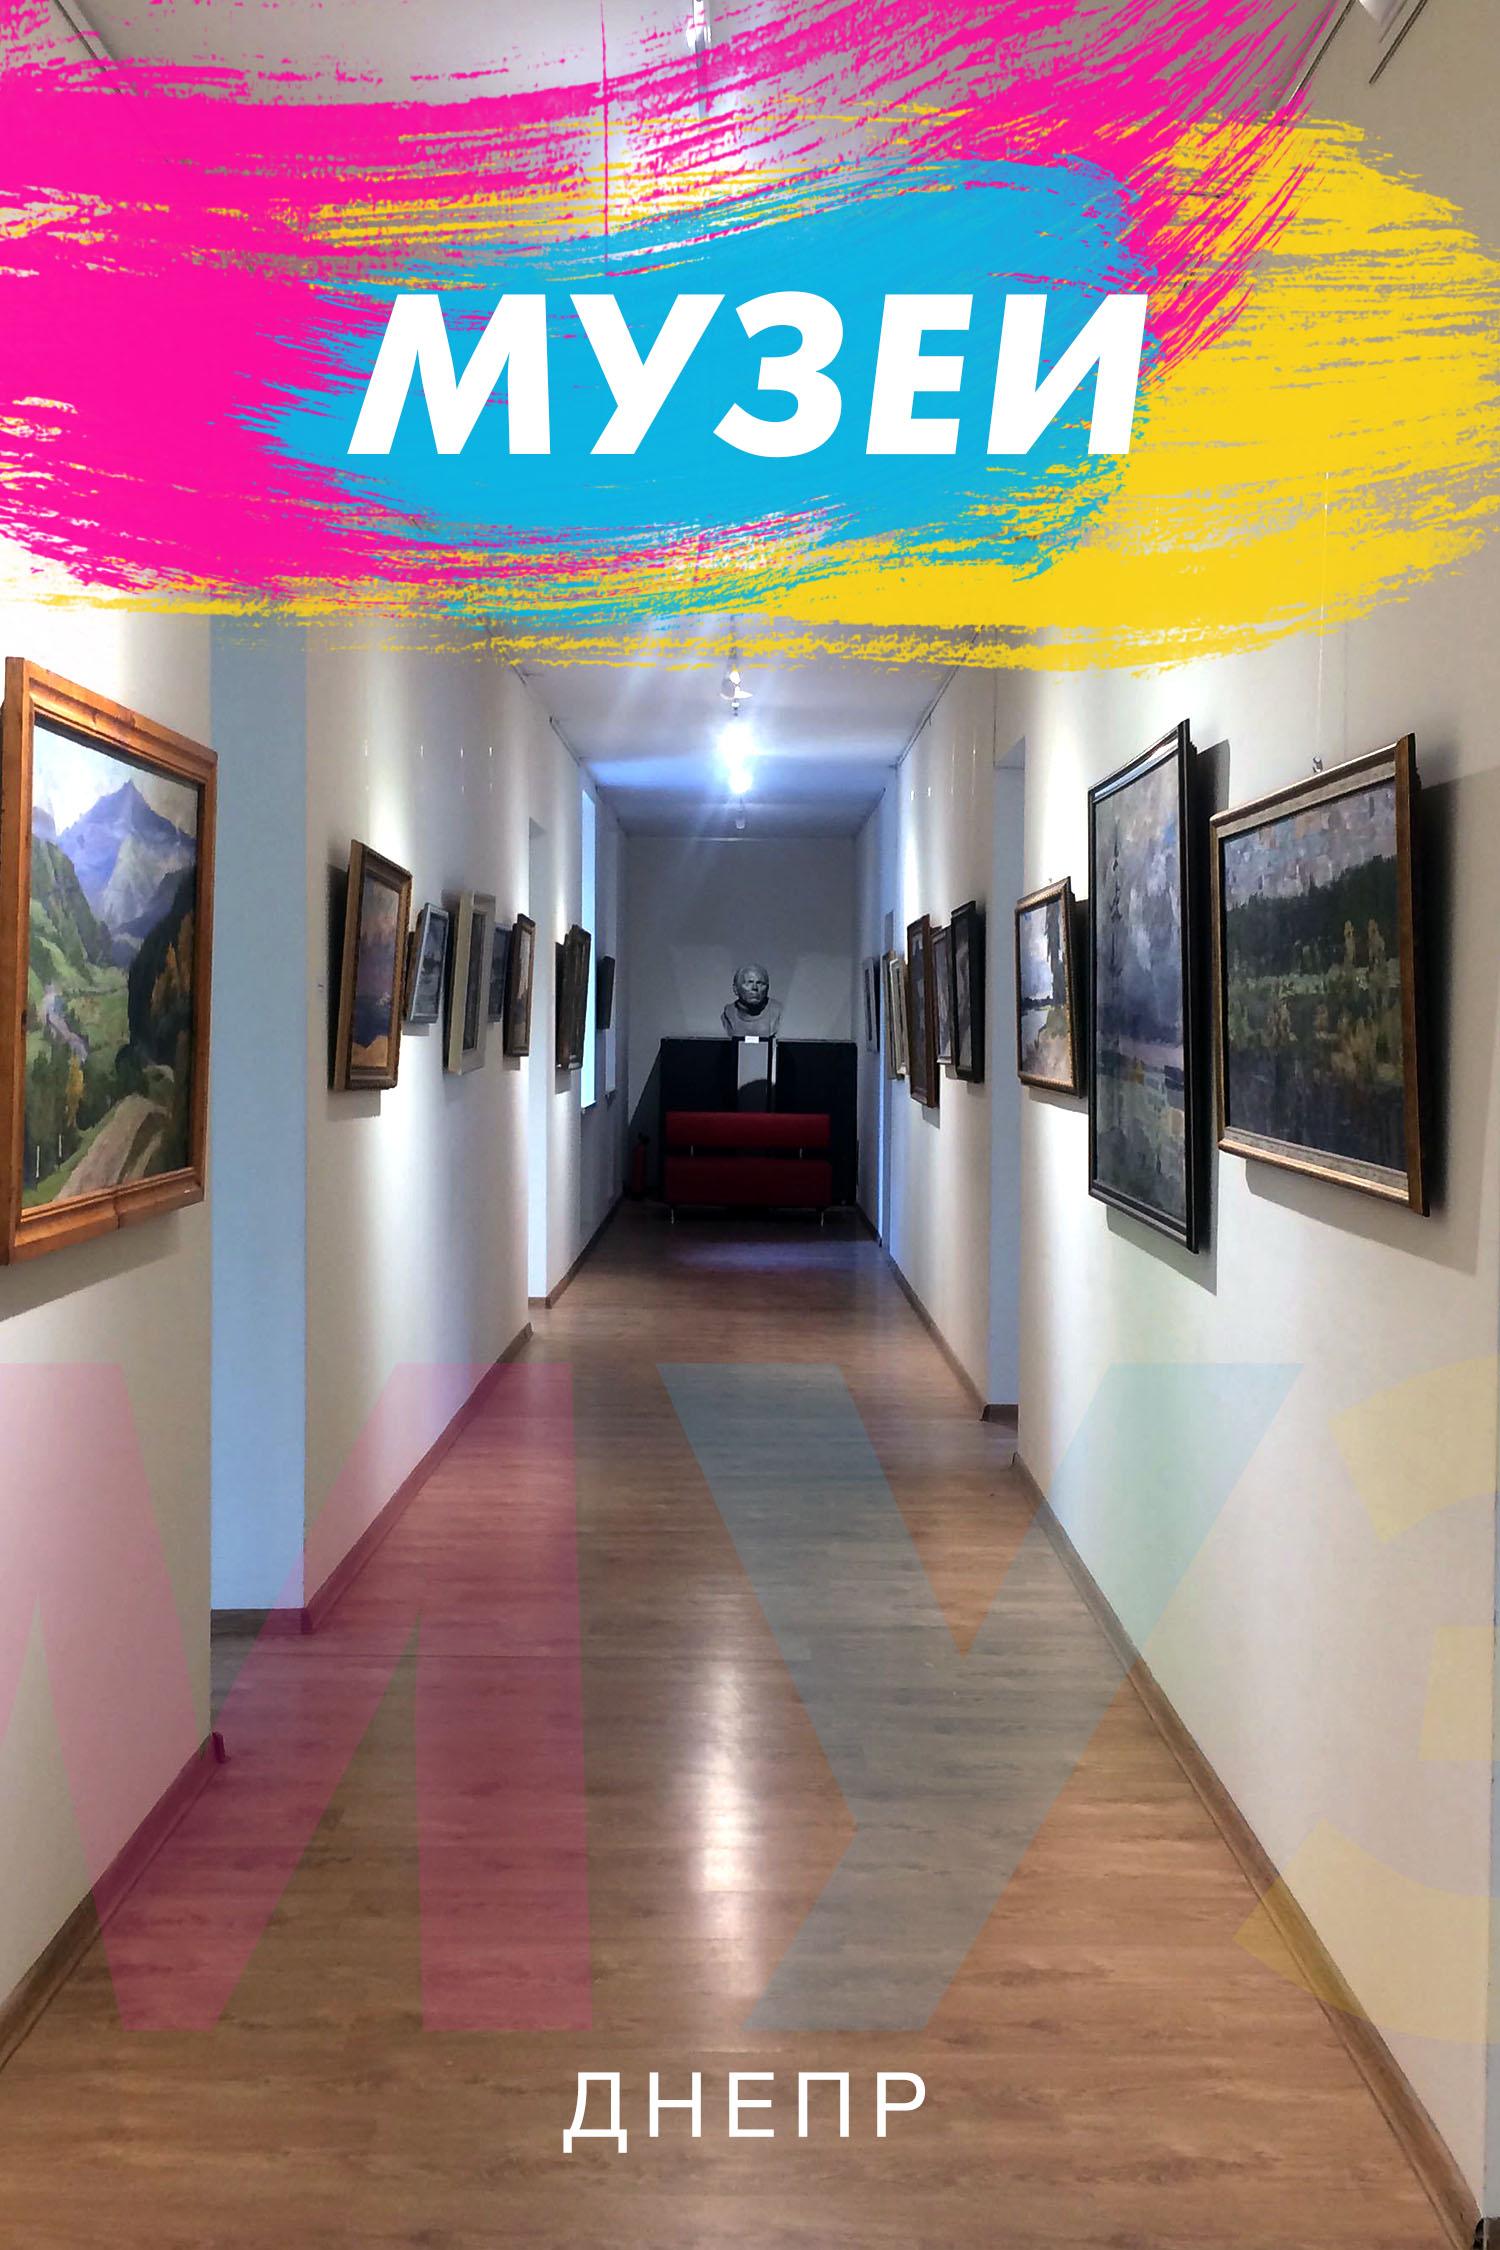 музеи днепр ковер.jpg